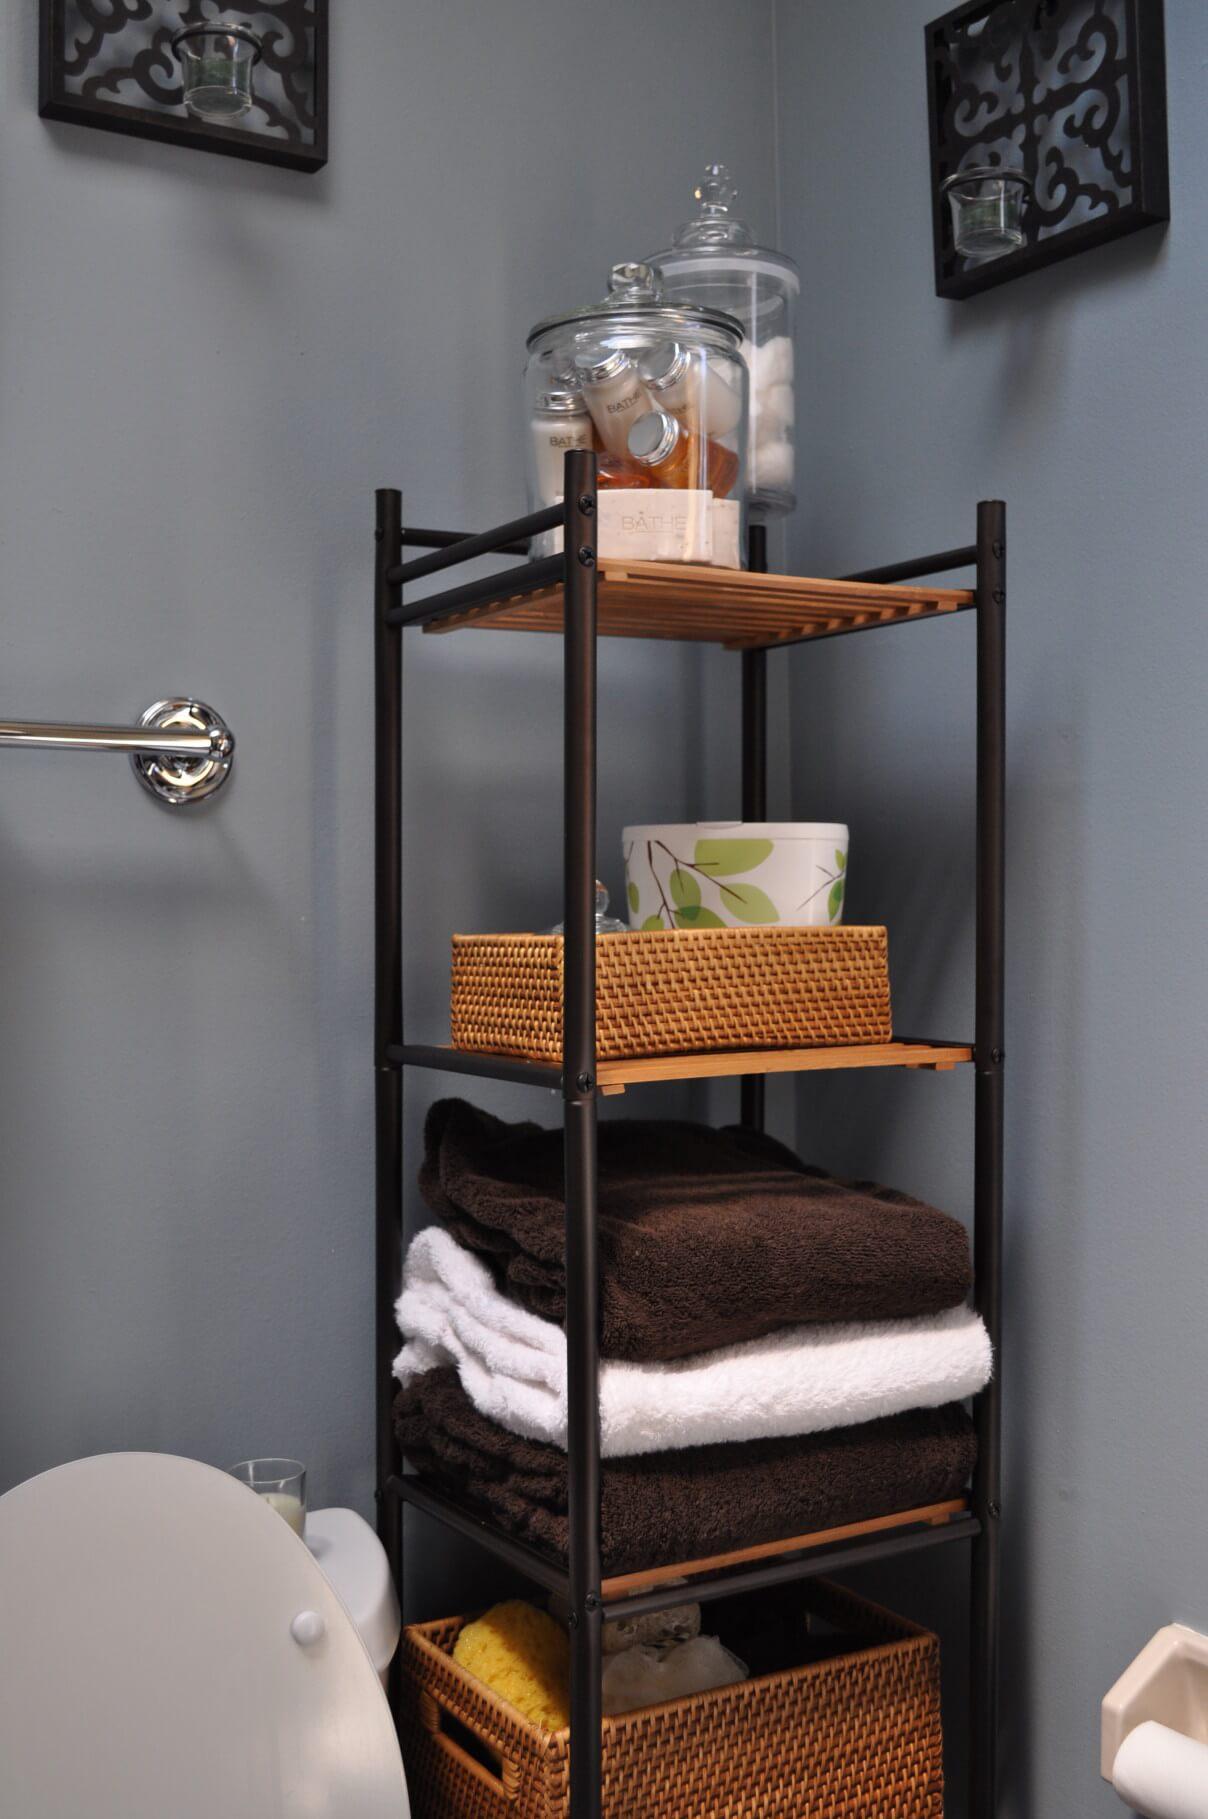 24-small-bathroom-storage-ideas-homebnc